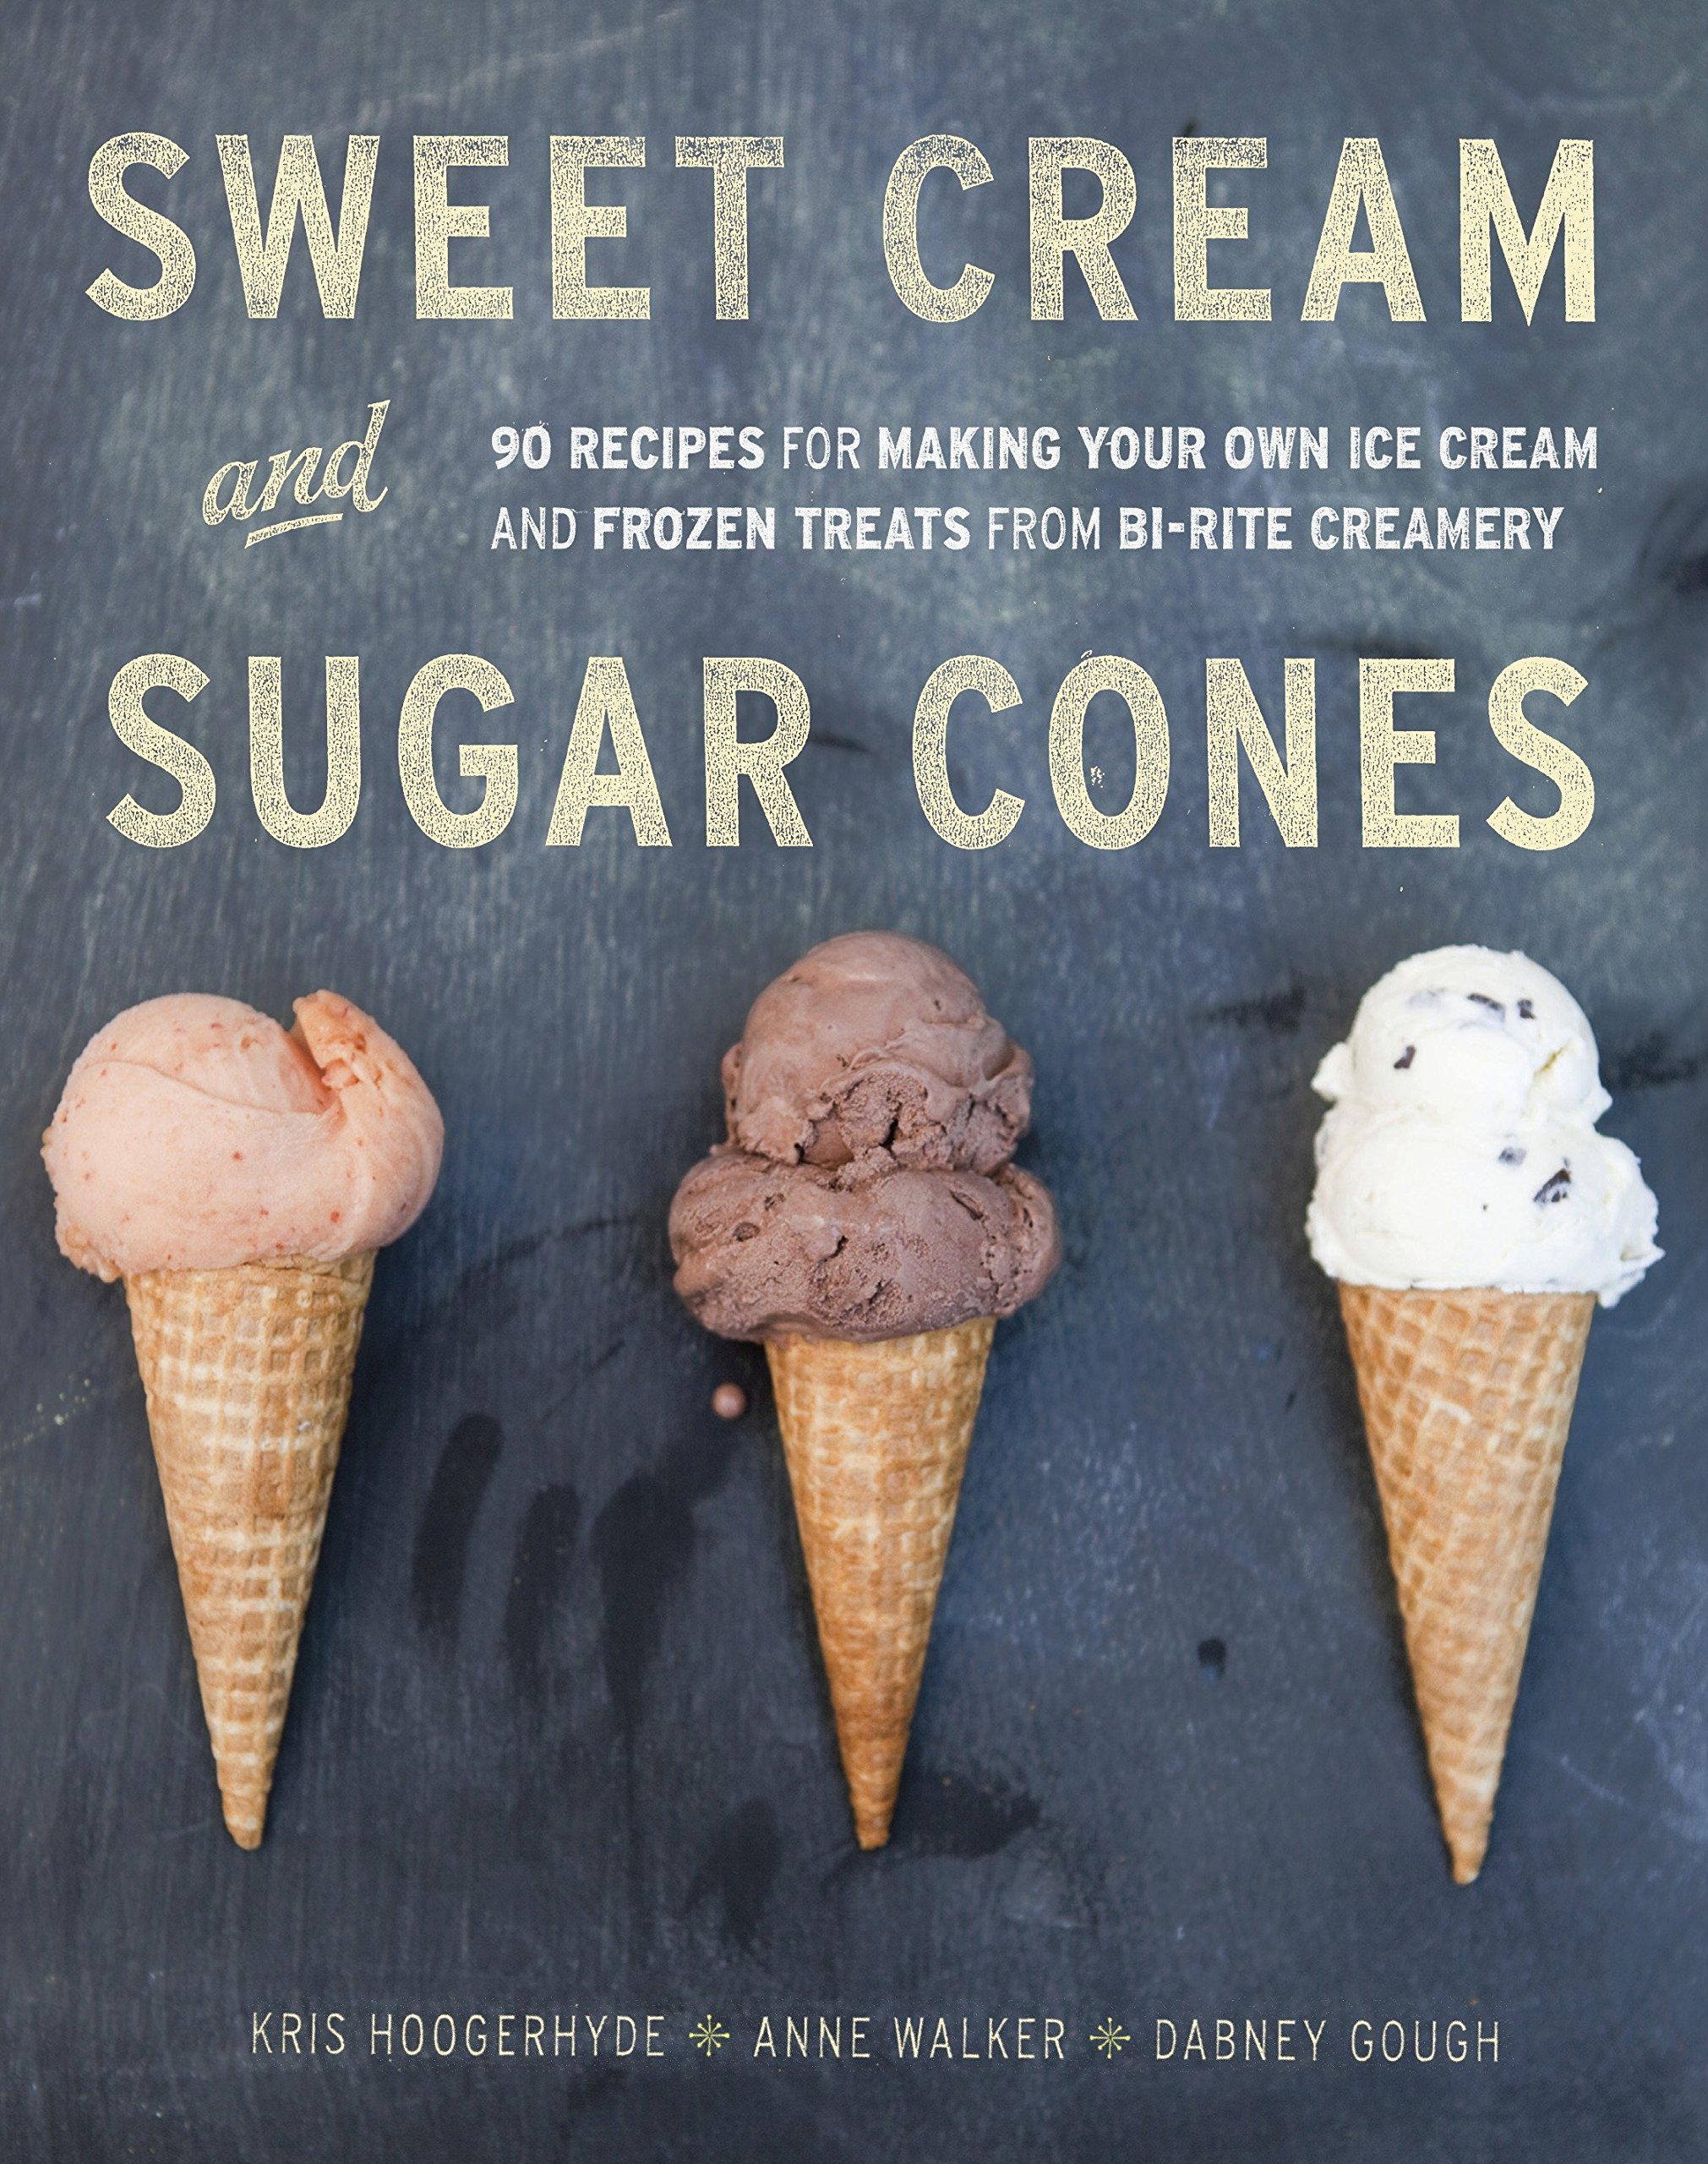 Homemade Chocolate-Dipped Ice Cream Cones